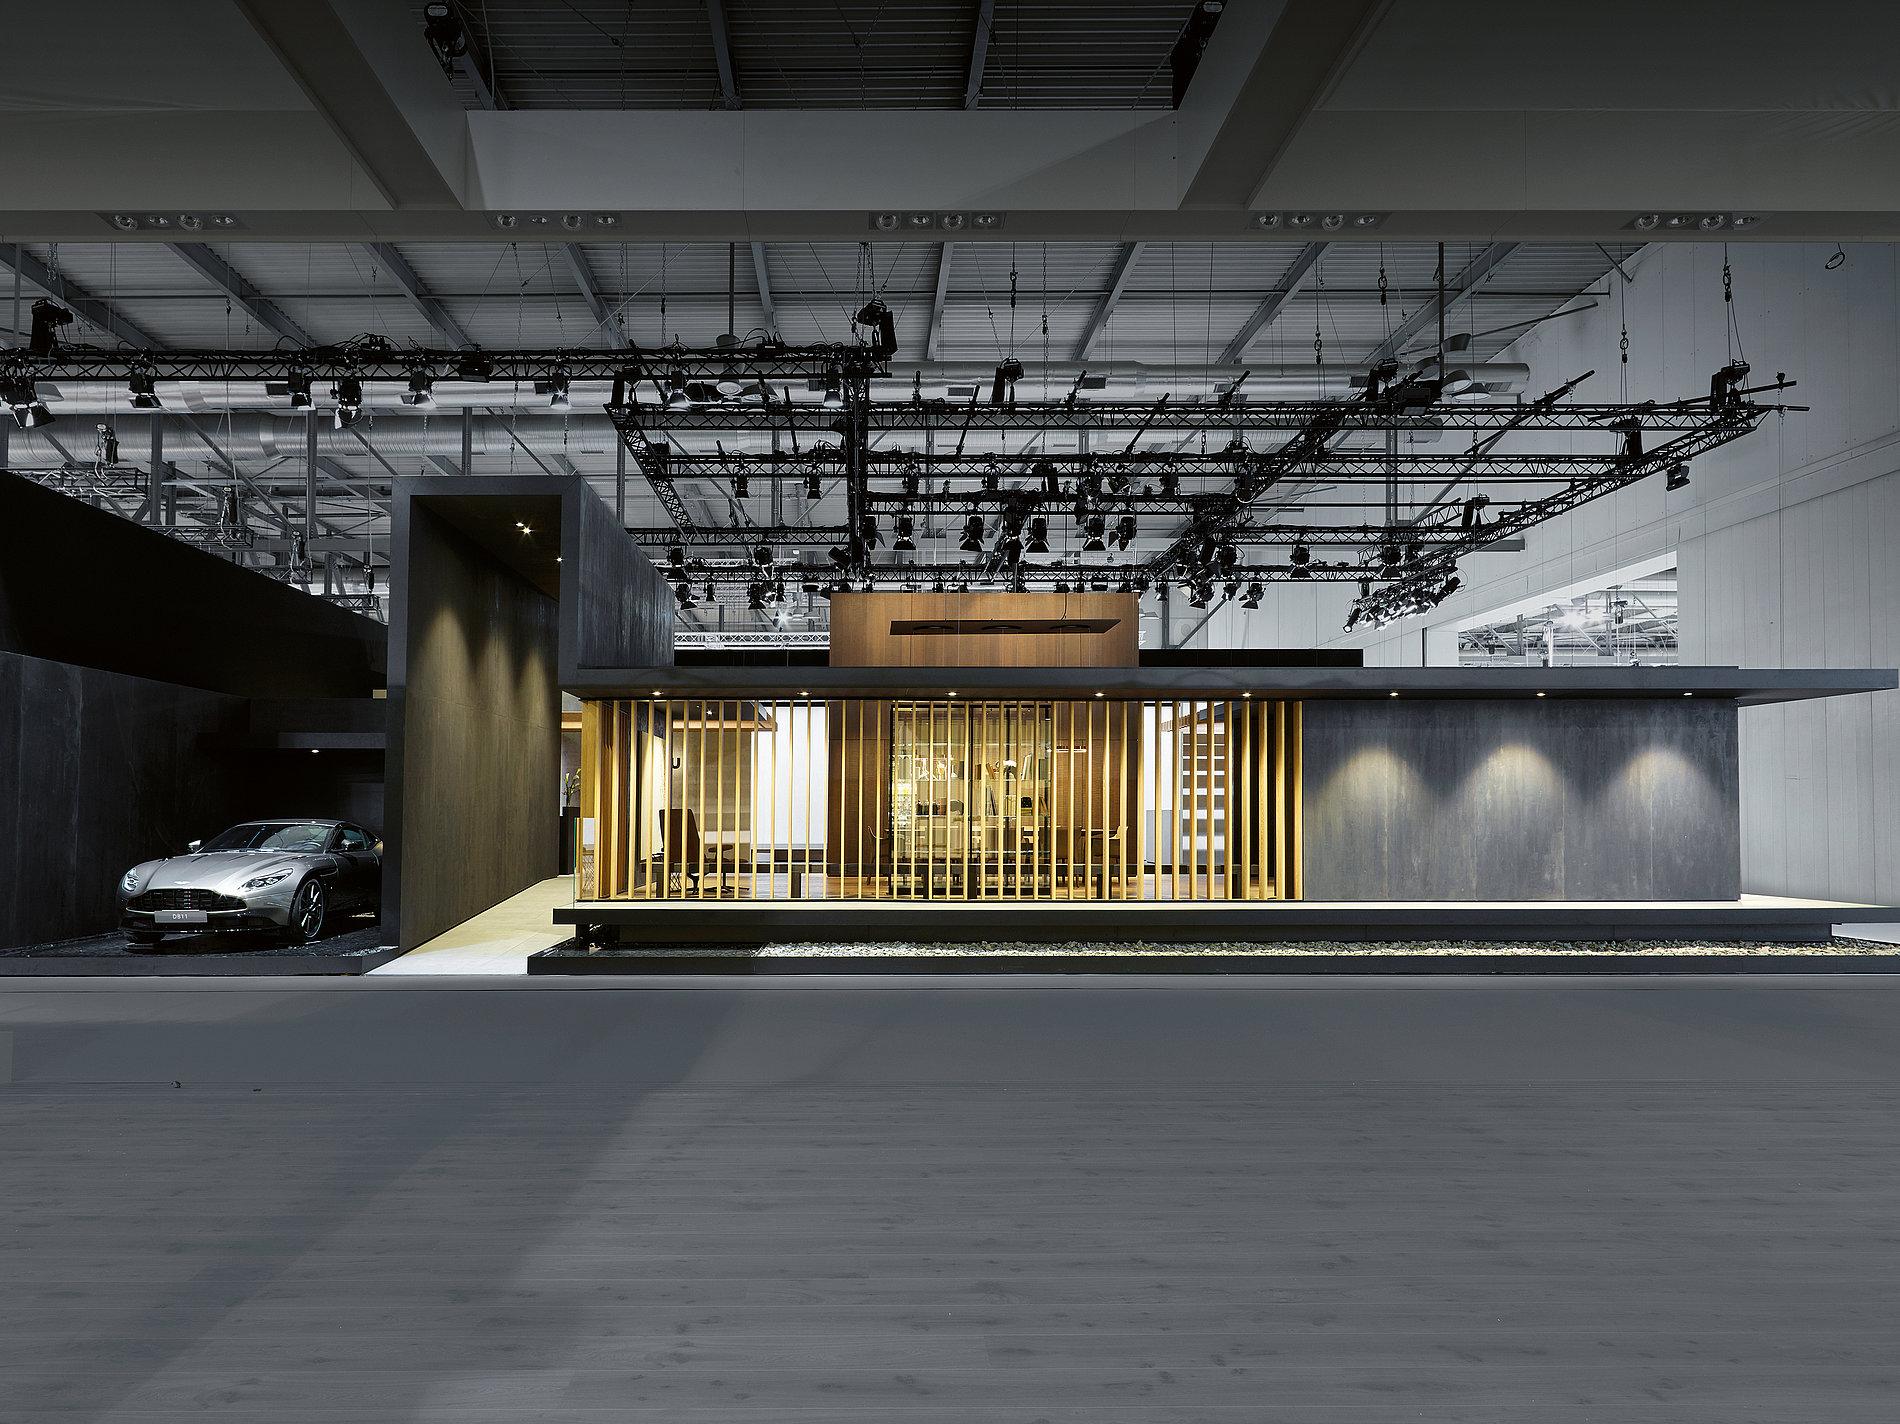 Gaggenau Fair Stand EuroCucina 2018 | Red Dot Design Award